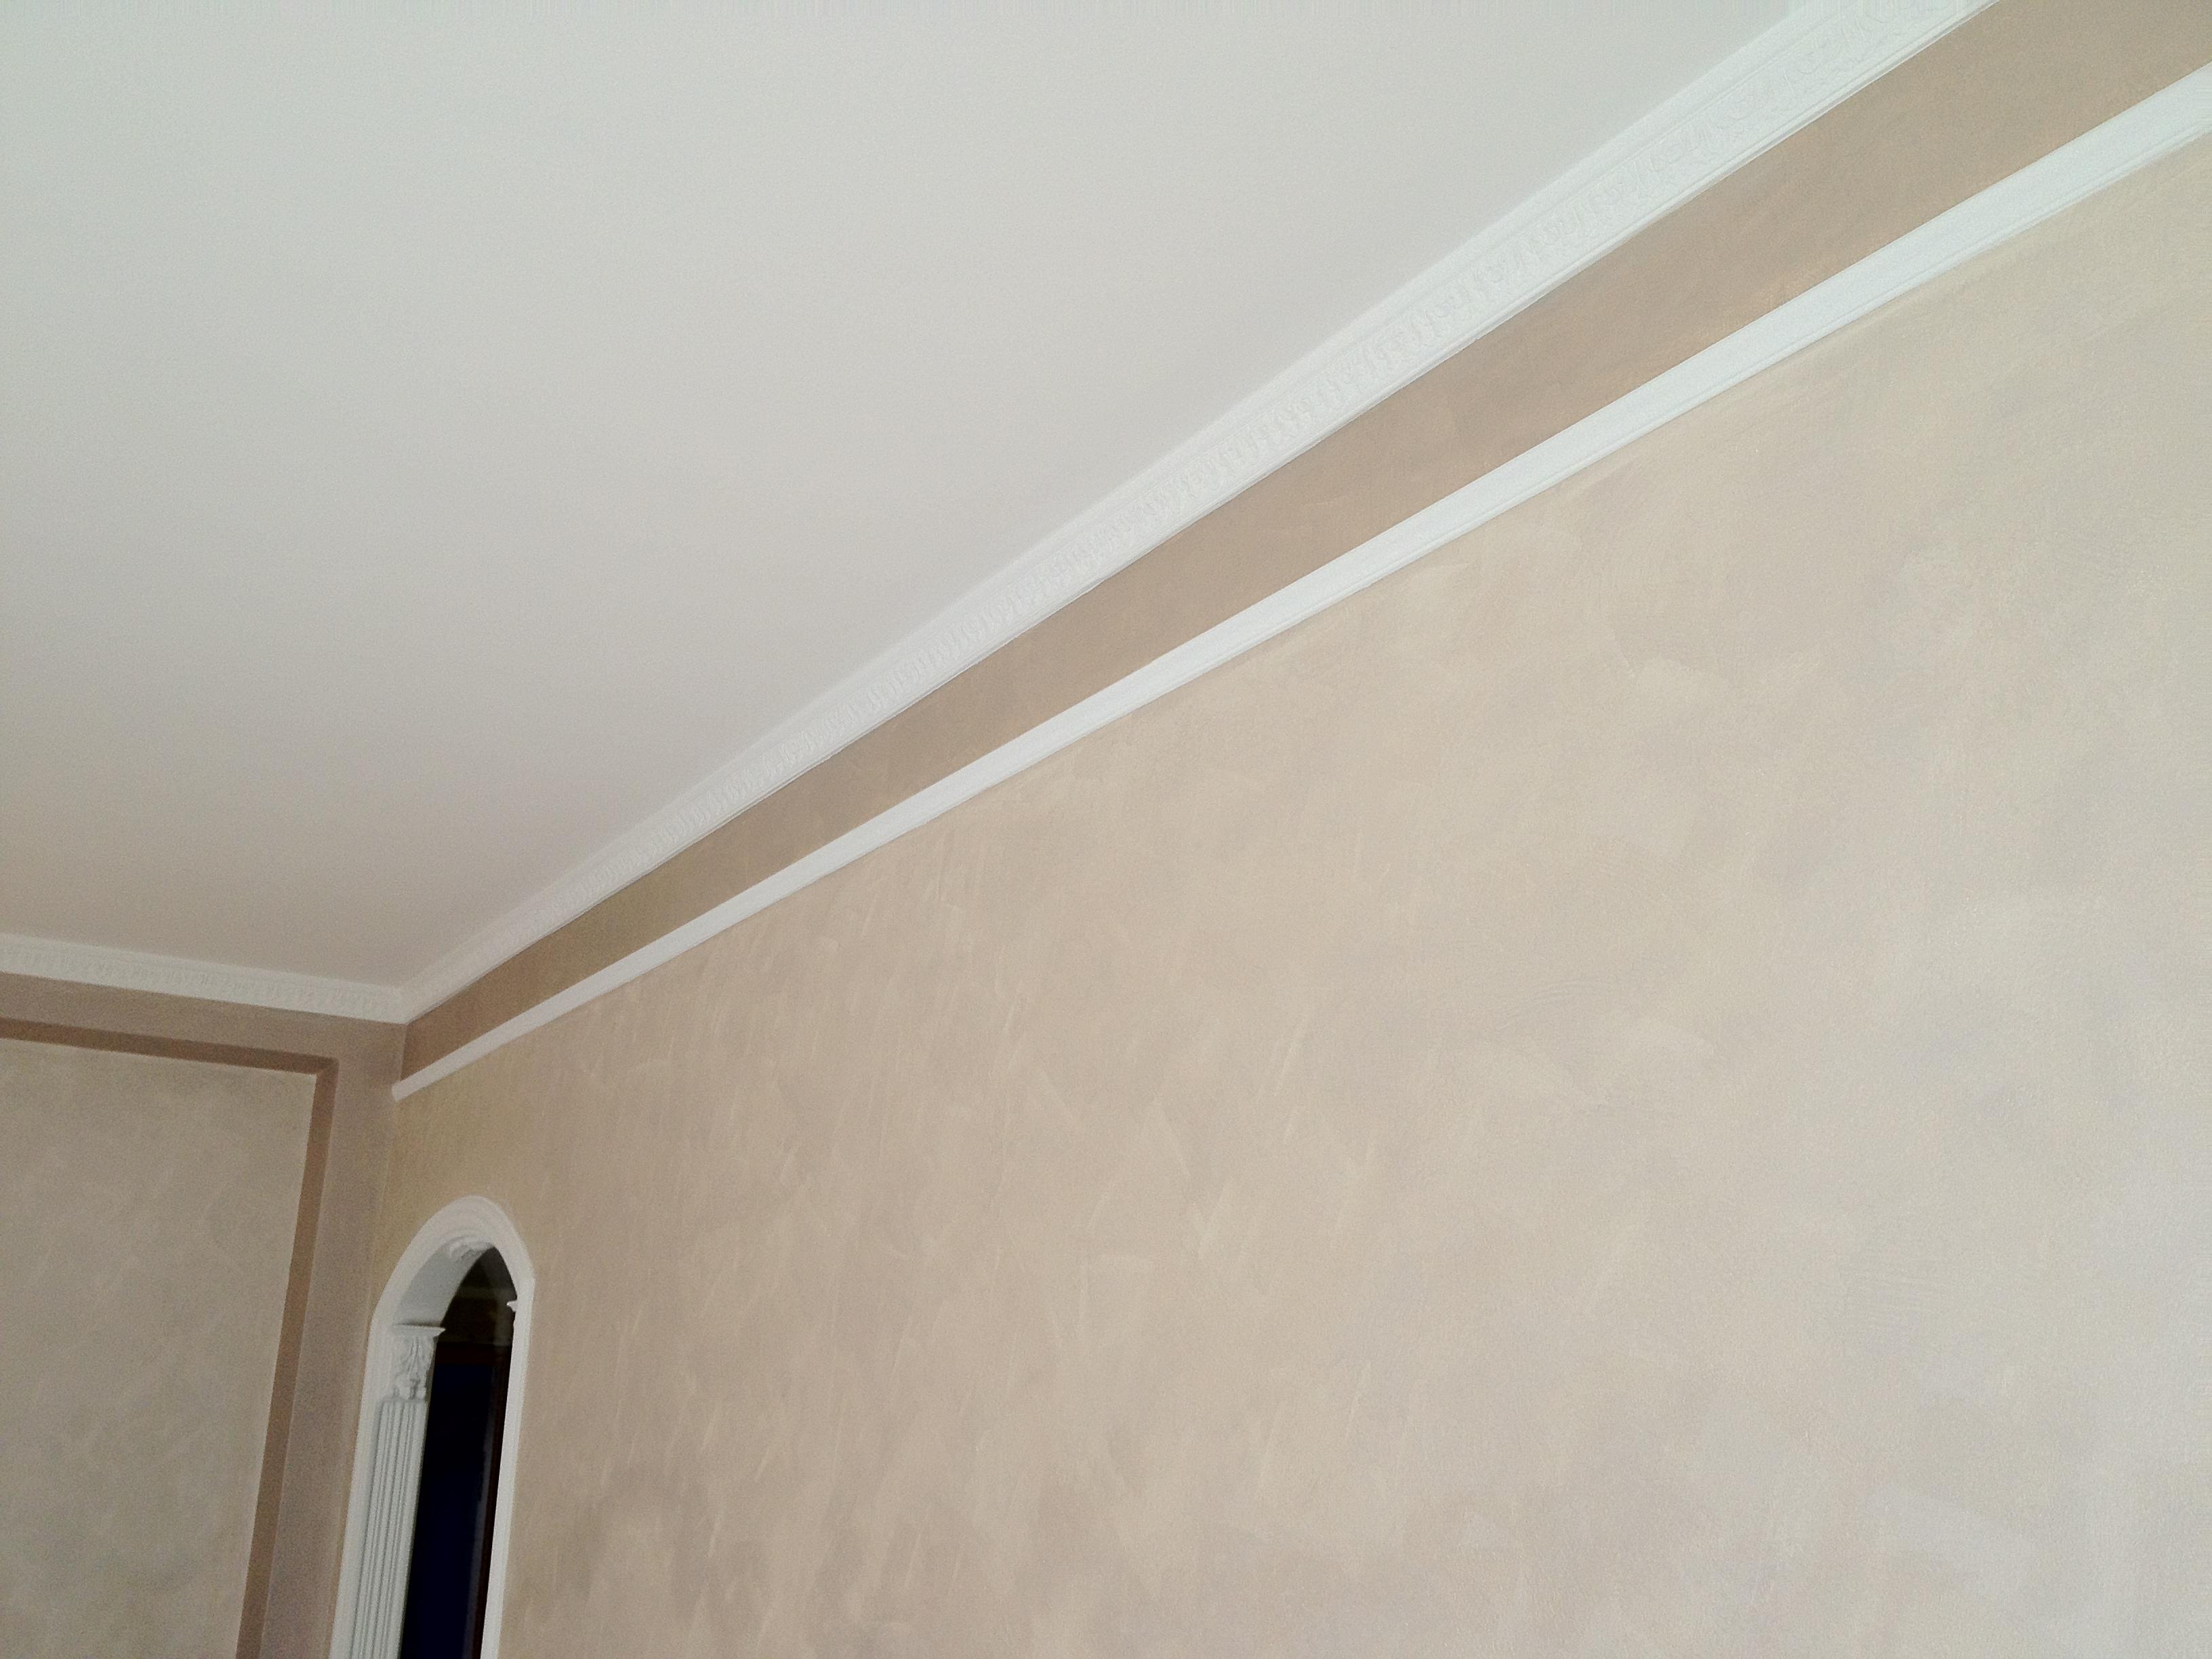 Imbiancatura milano imbinachino milano stucco veneziano for Imbiancatura delle pareti